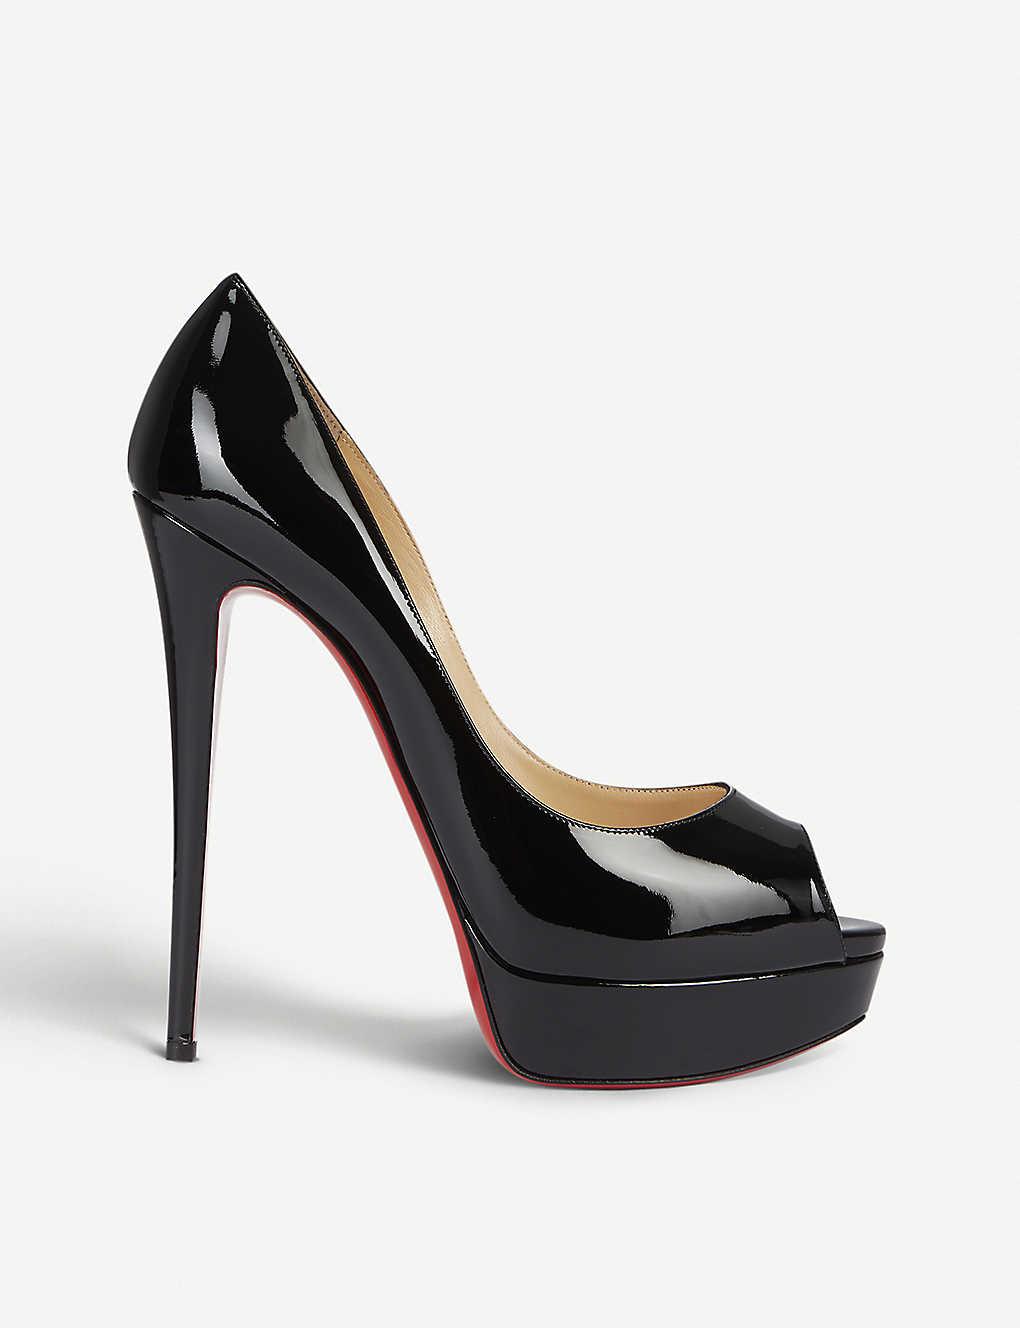 premium selection 5c882 990f5 Lady Peep 150 patent calf